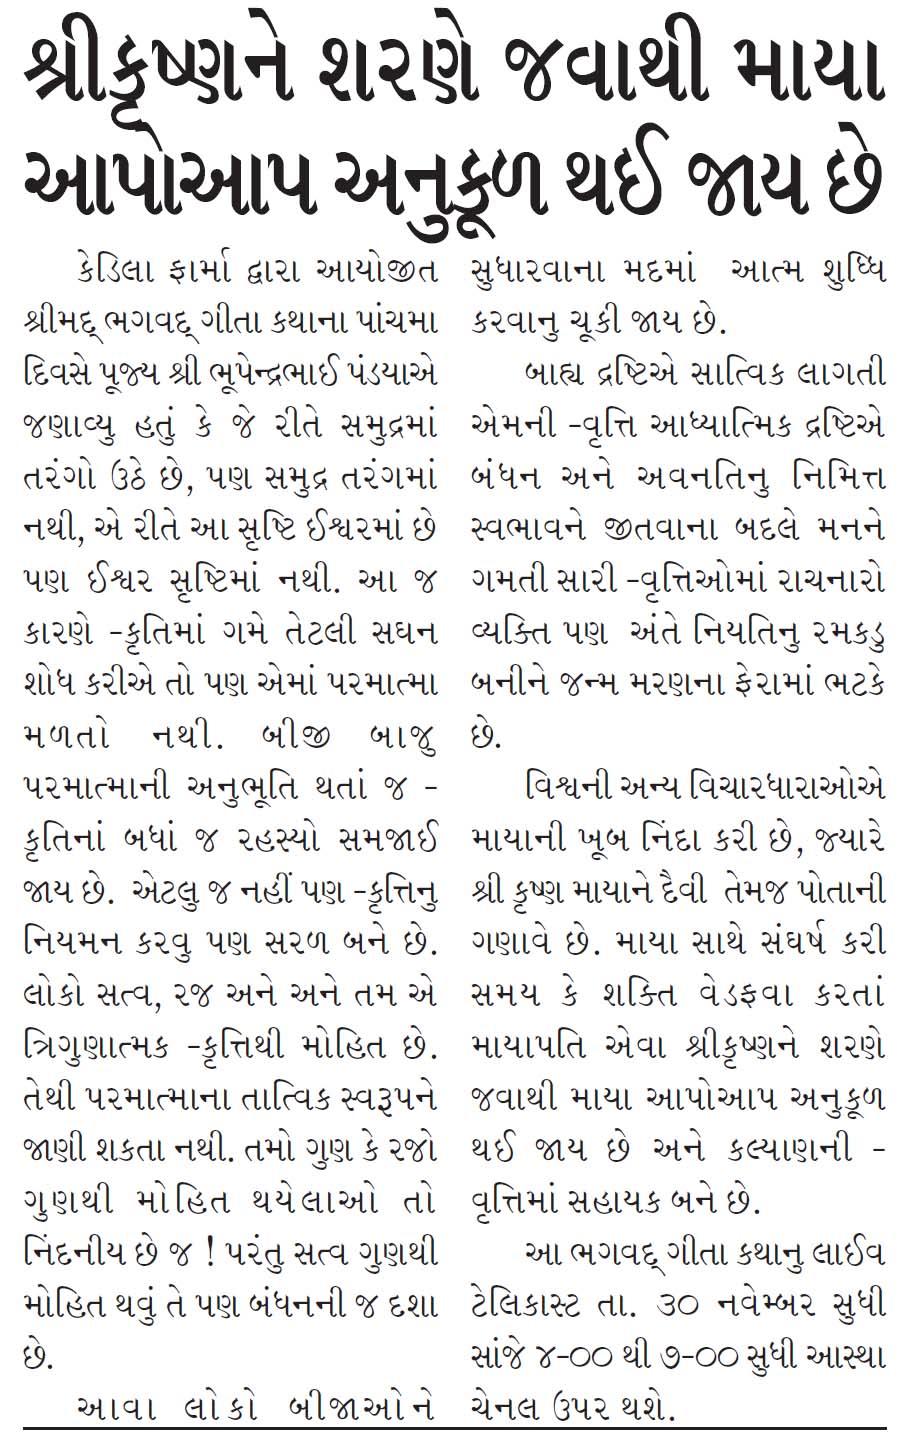 Prabhat Ahmdebad